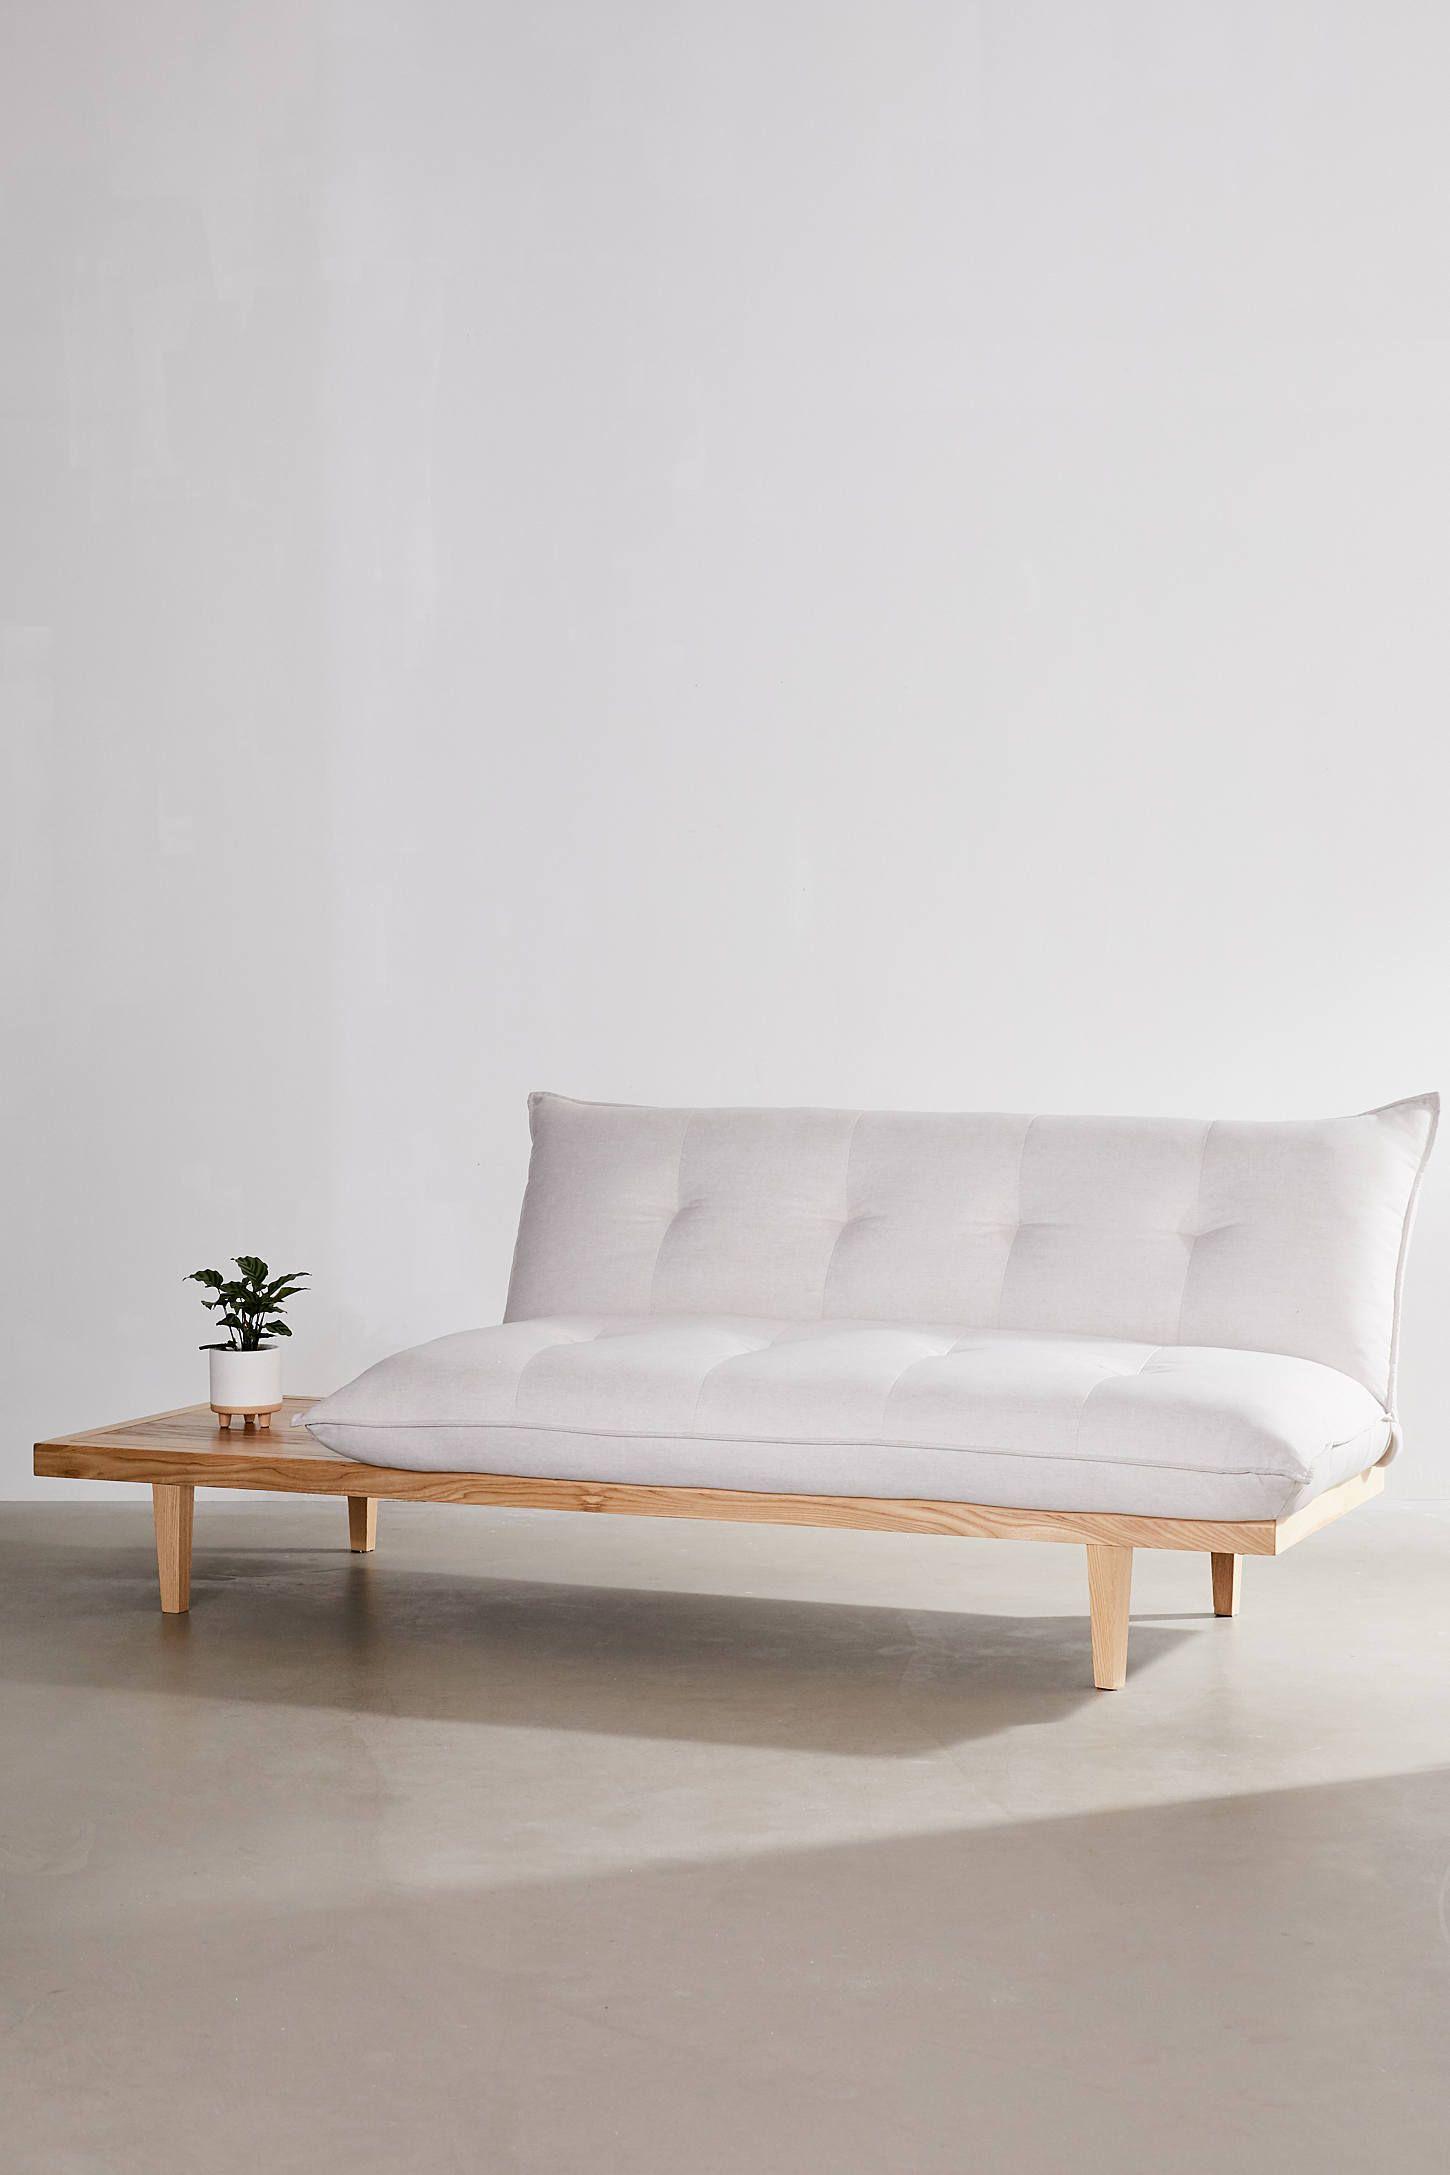 Reid Side Table Convertible Sofa in 2019 | Minimalist ...